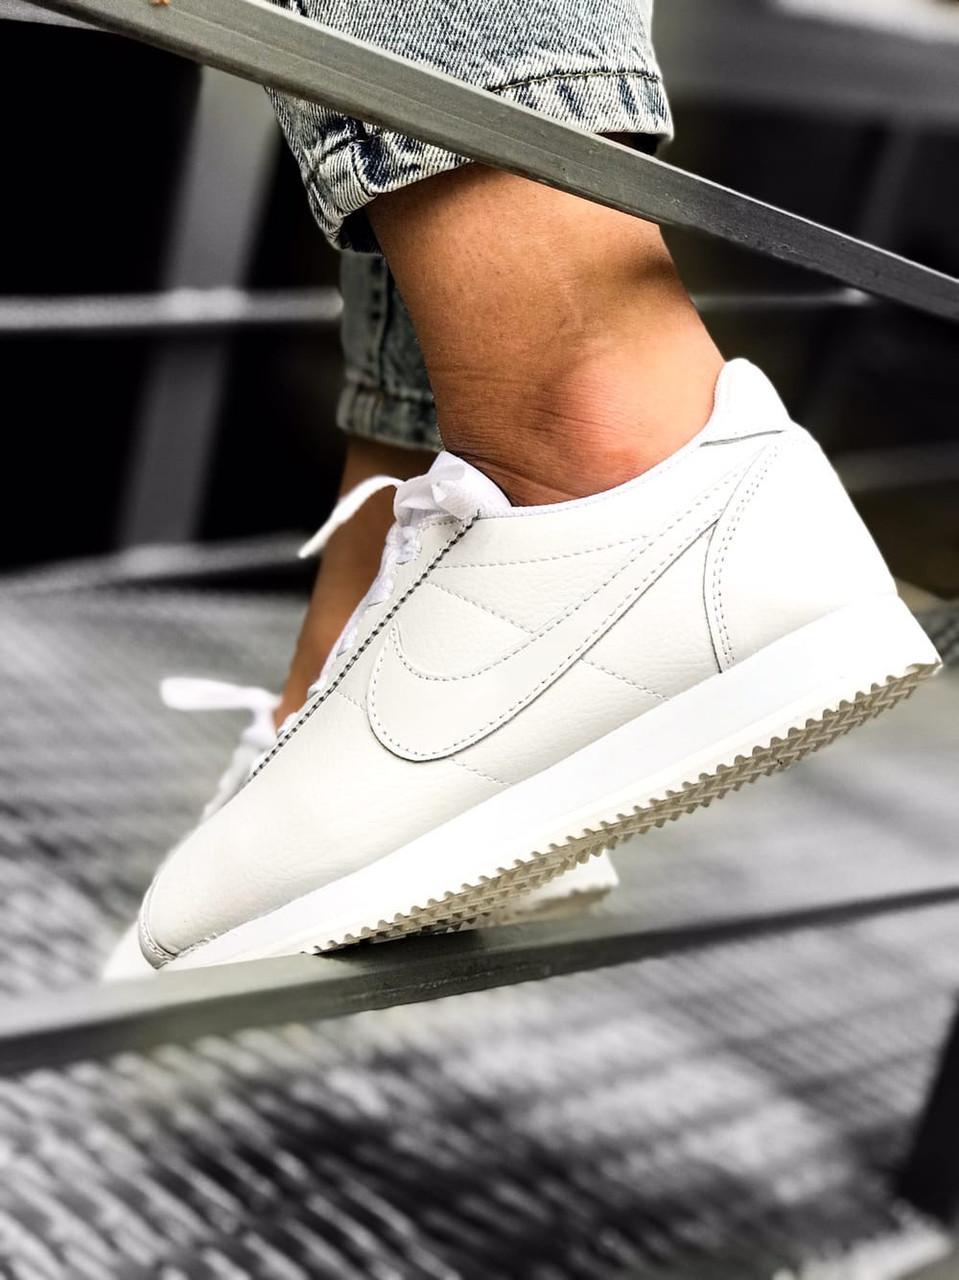 Кроссовки женские Nike Cortez белые White